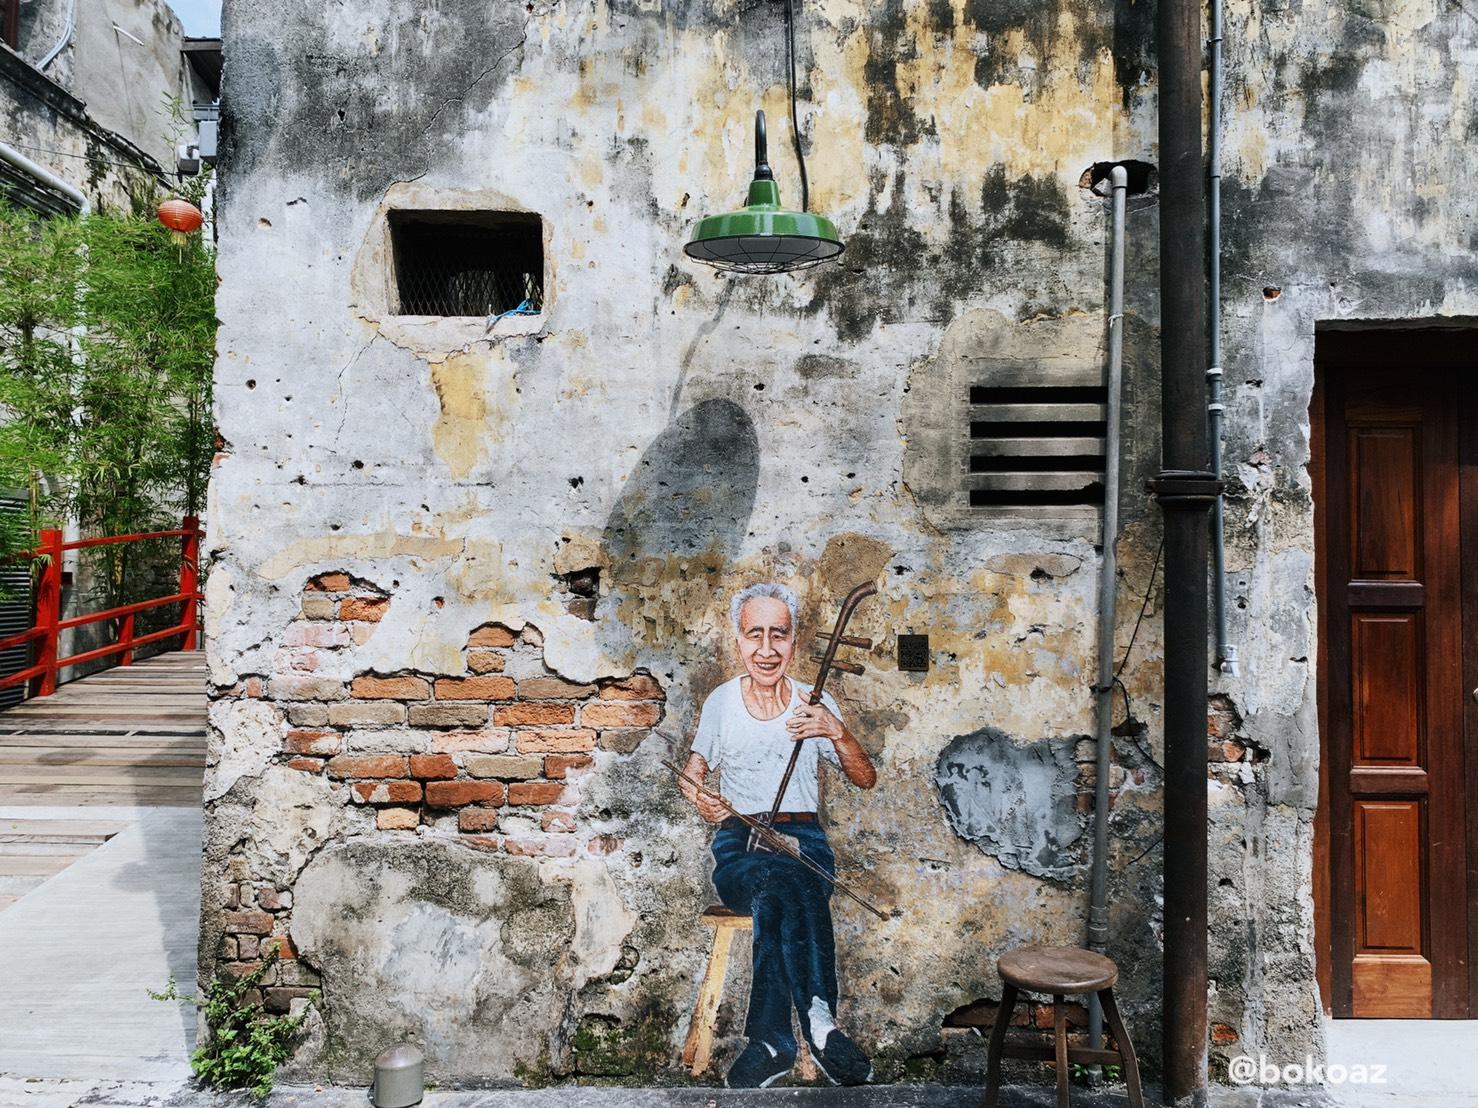 Kwai Chi Hong Murals